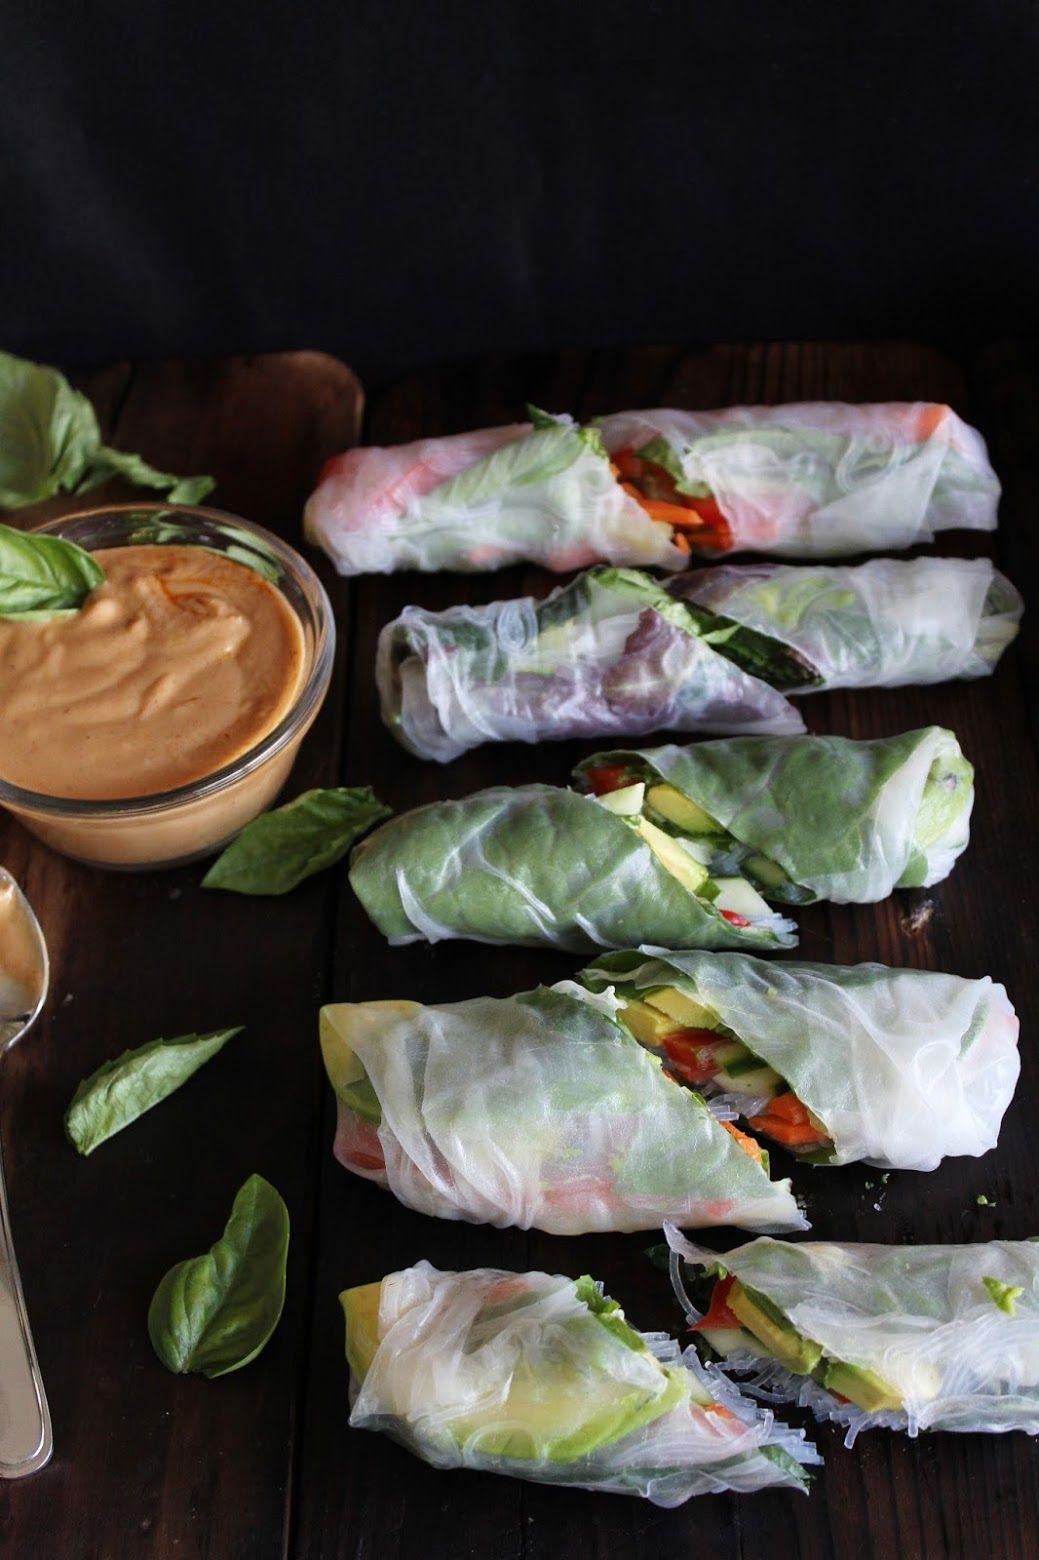 This Rawsome Vegan Life: #vegan fresh summer rolls with basil, avocado, kale + spicy garlic peanut sauce